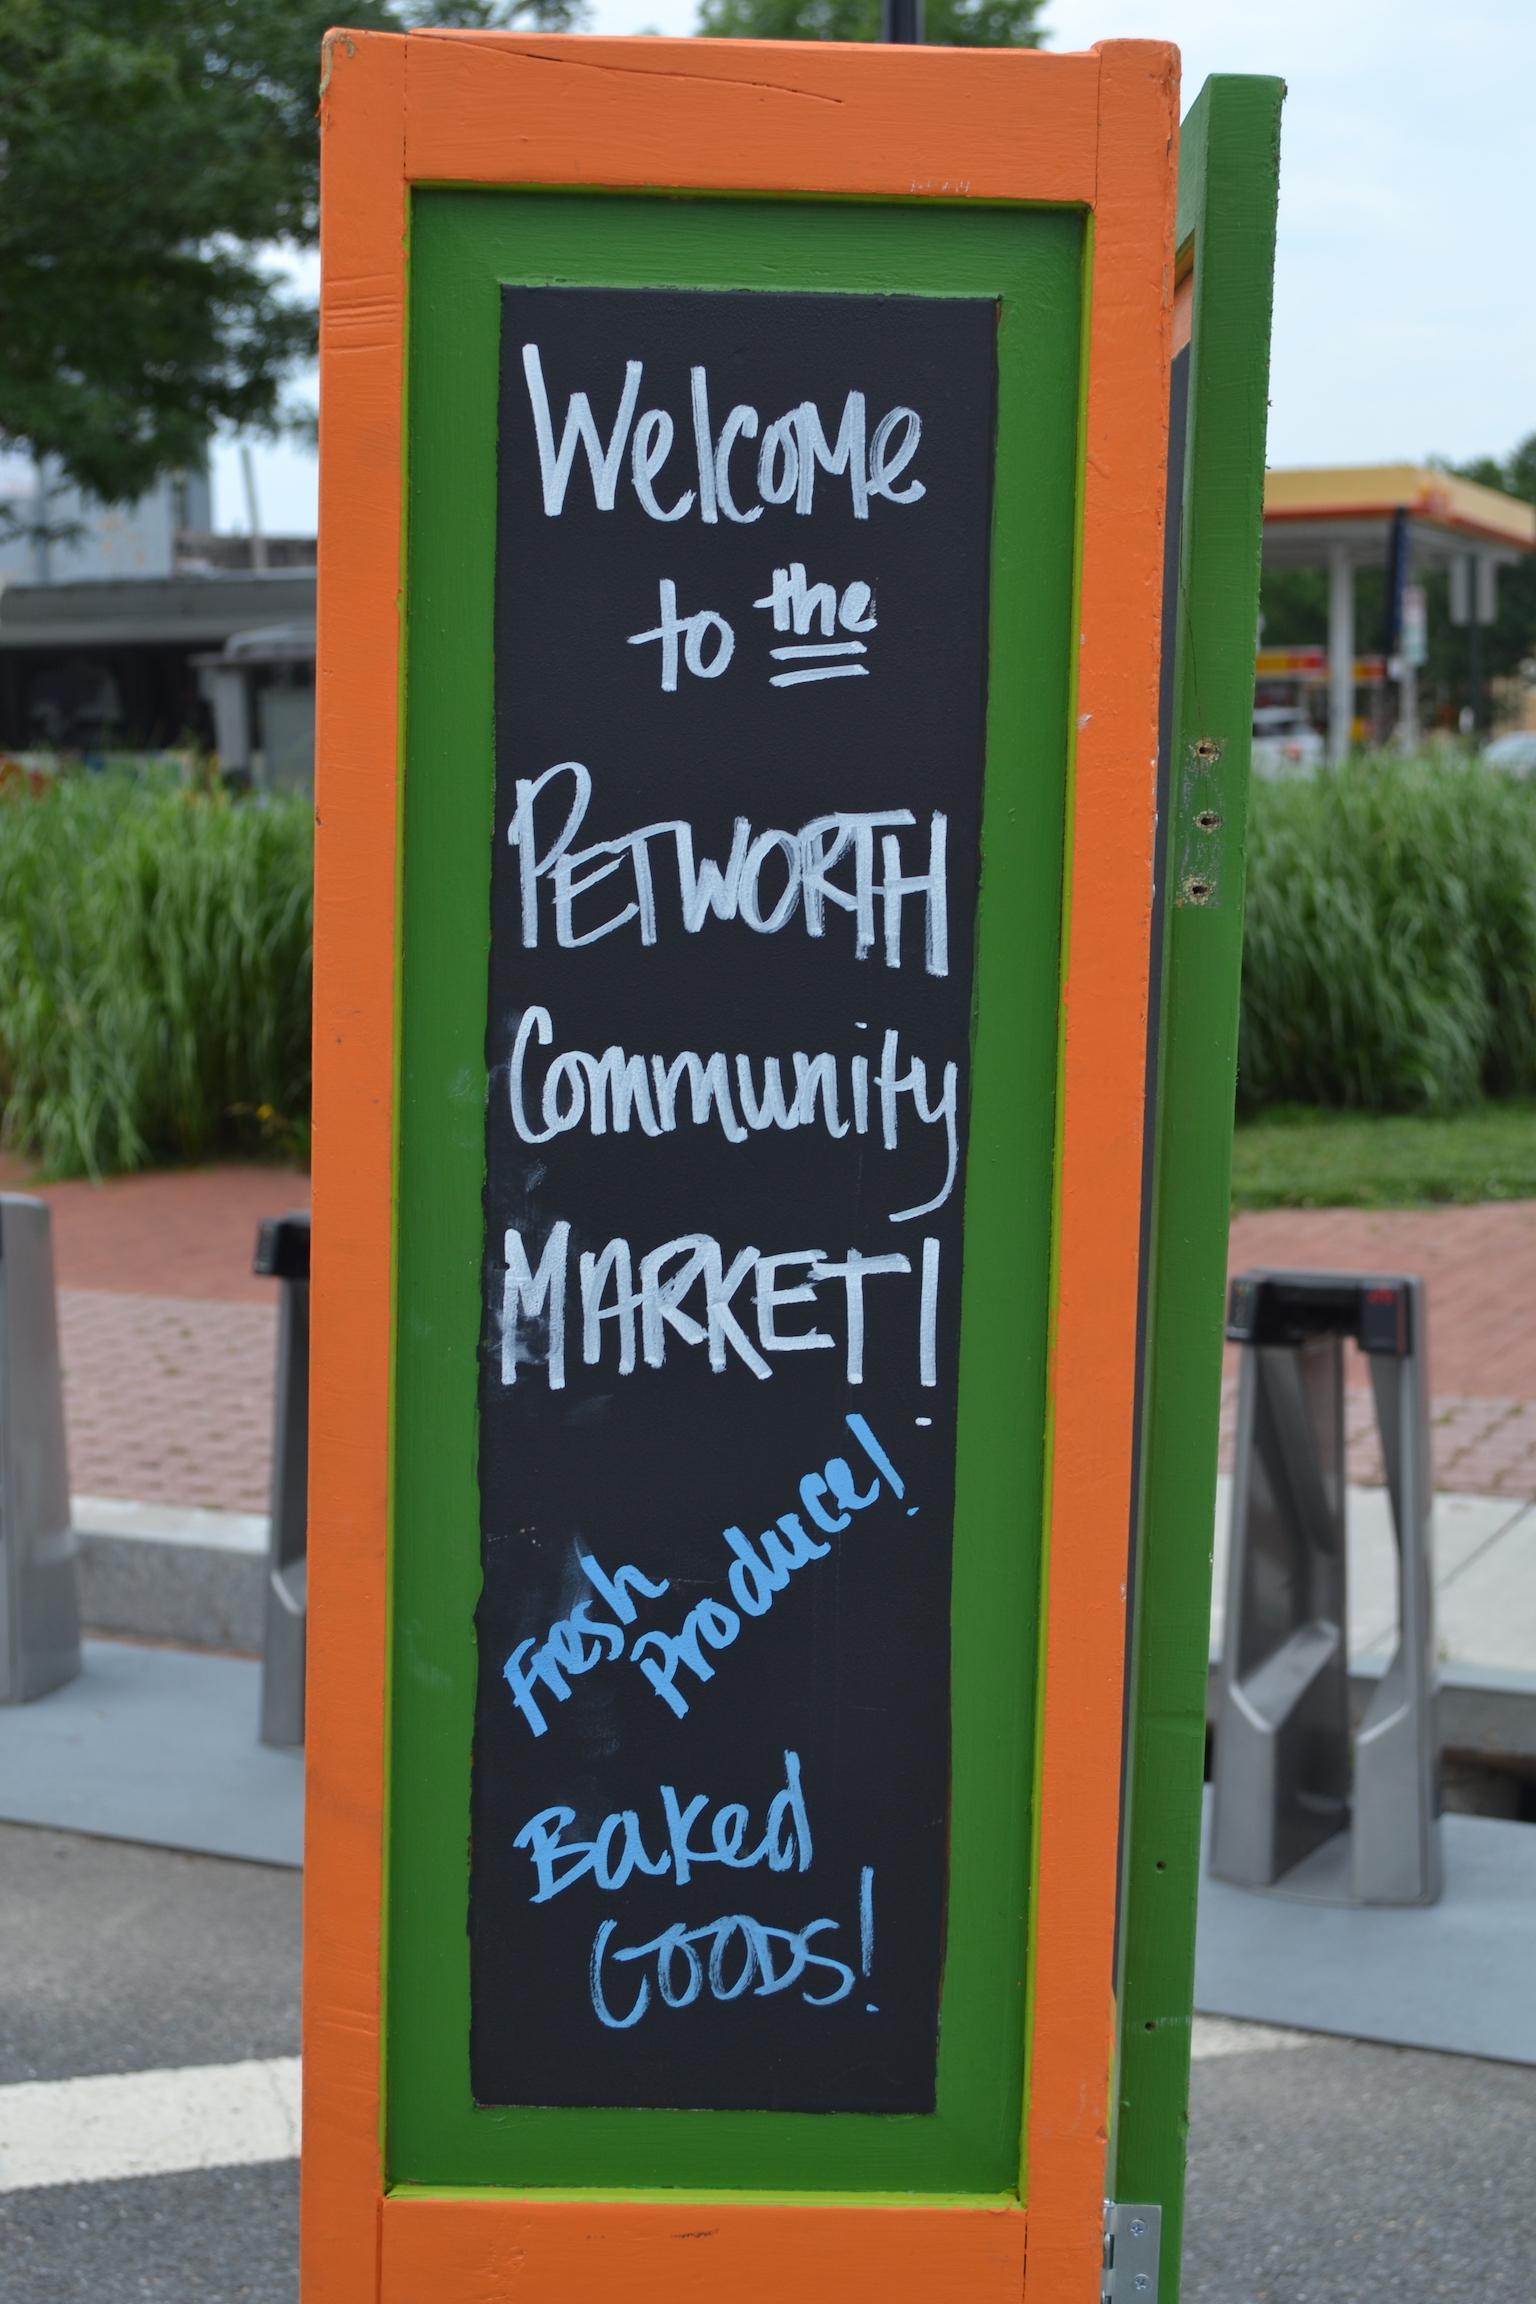 Petworth Market 6-13-15